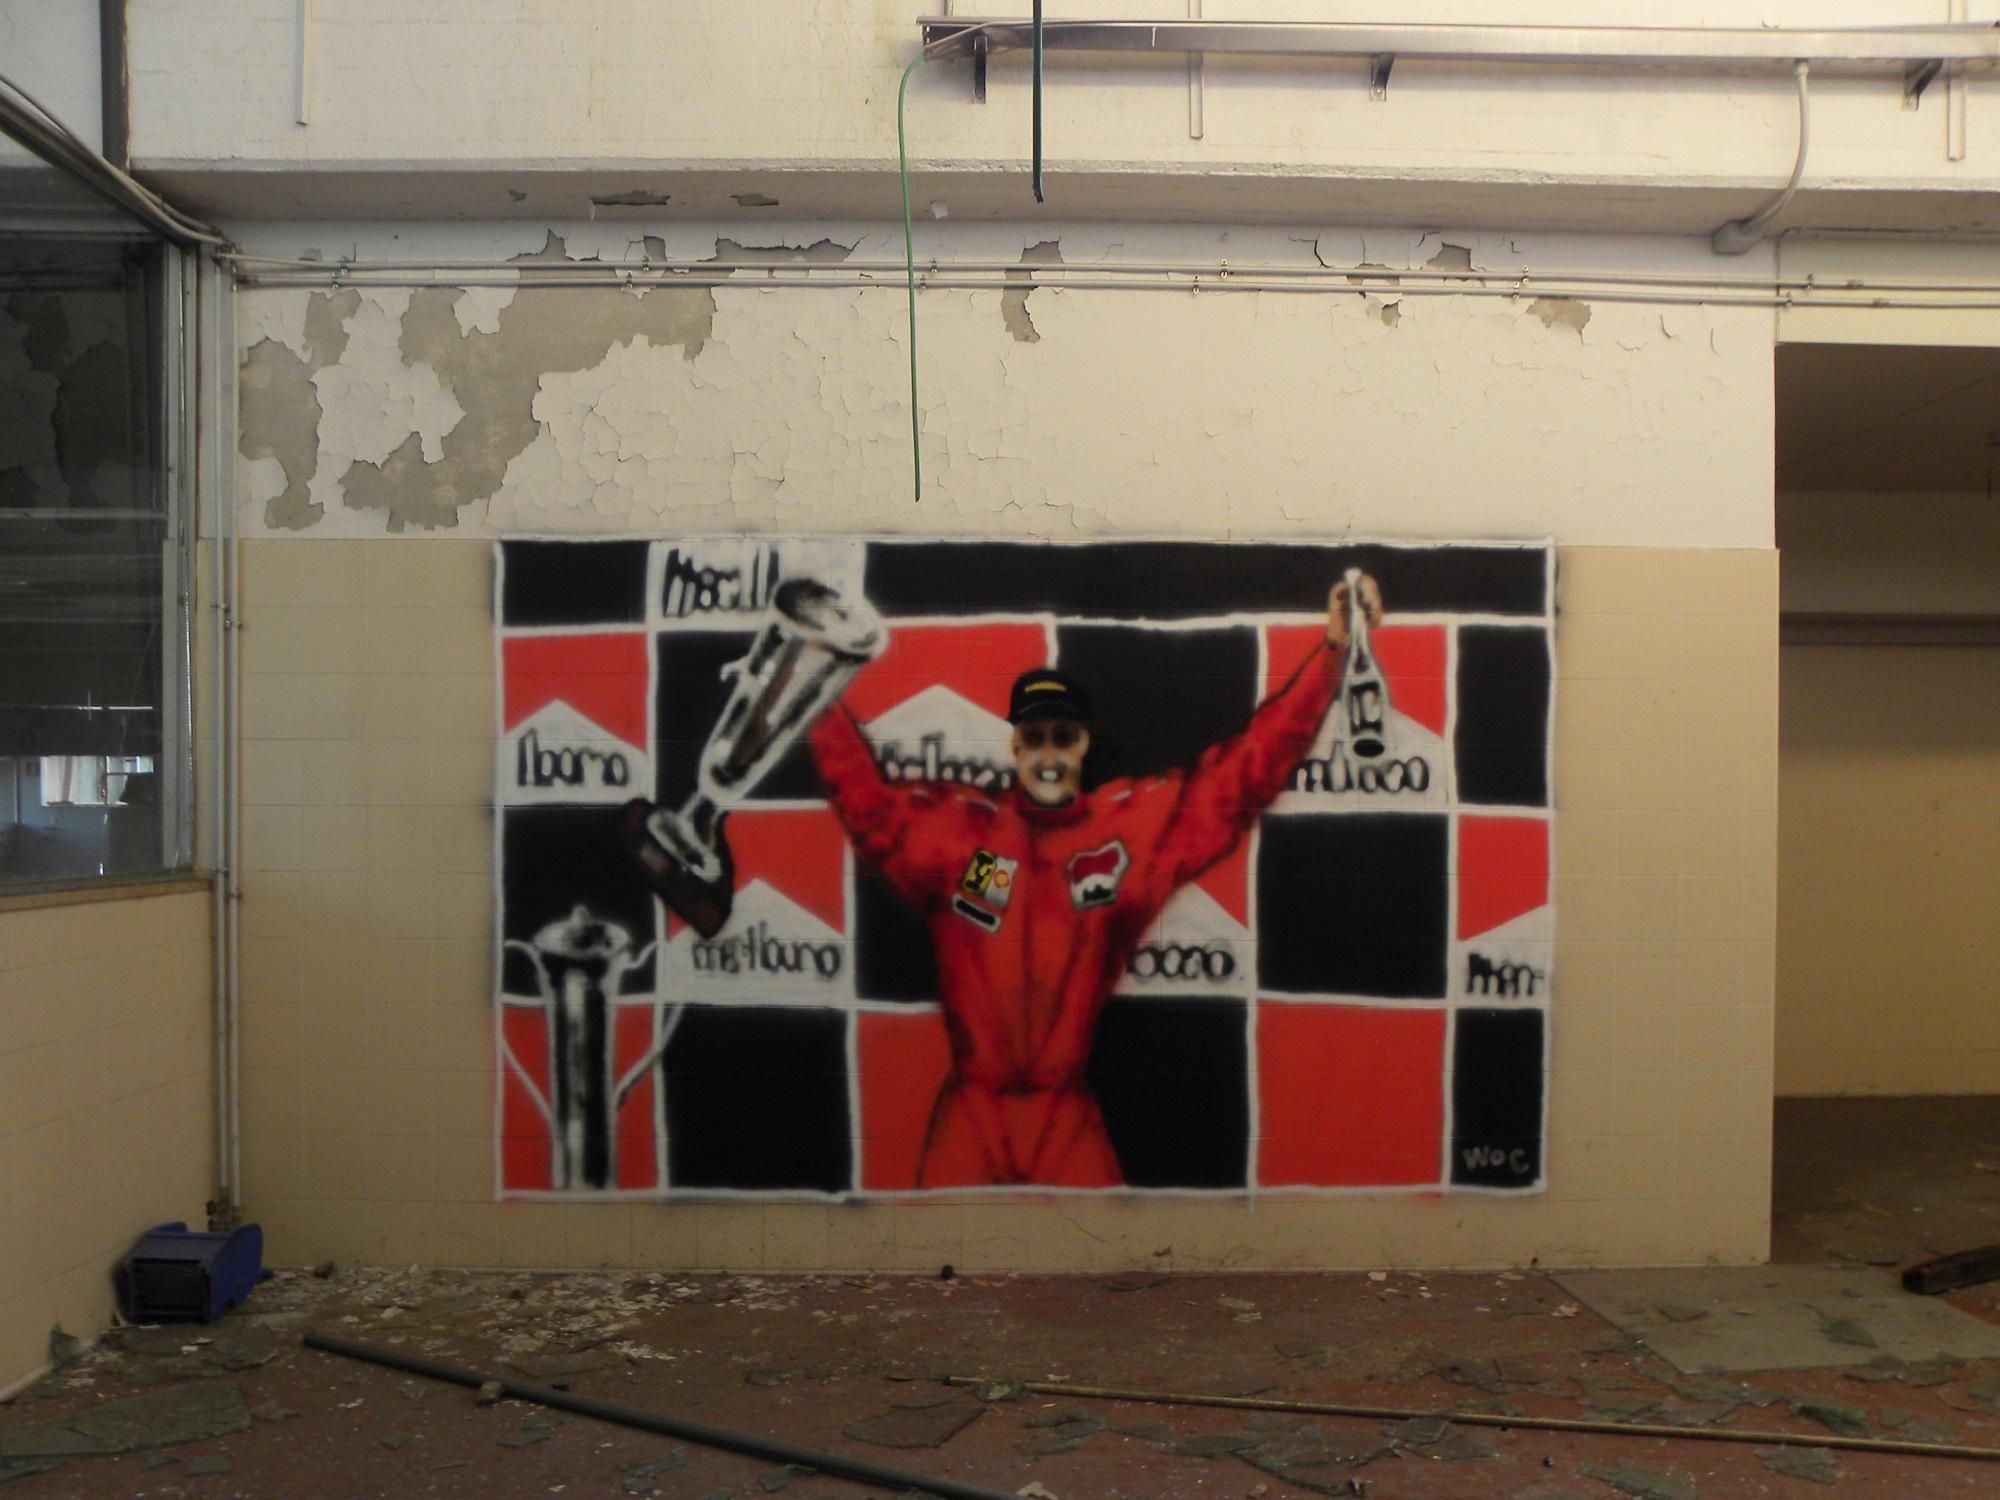 WOC Street Art